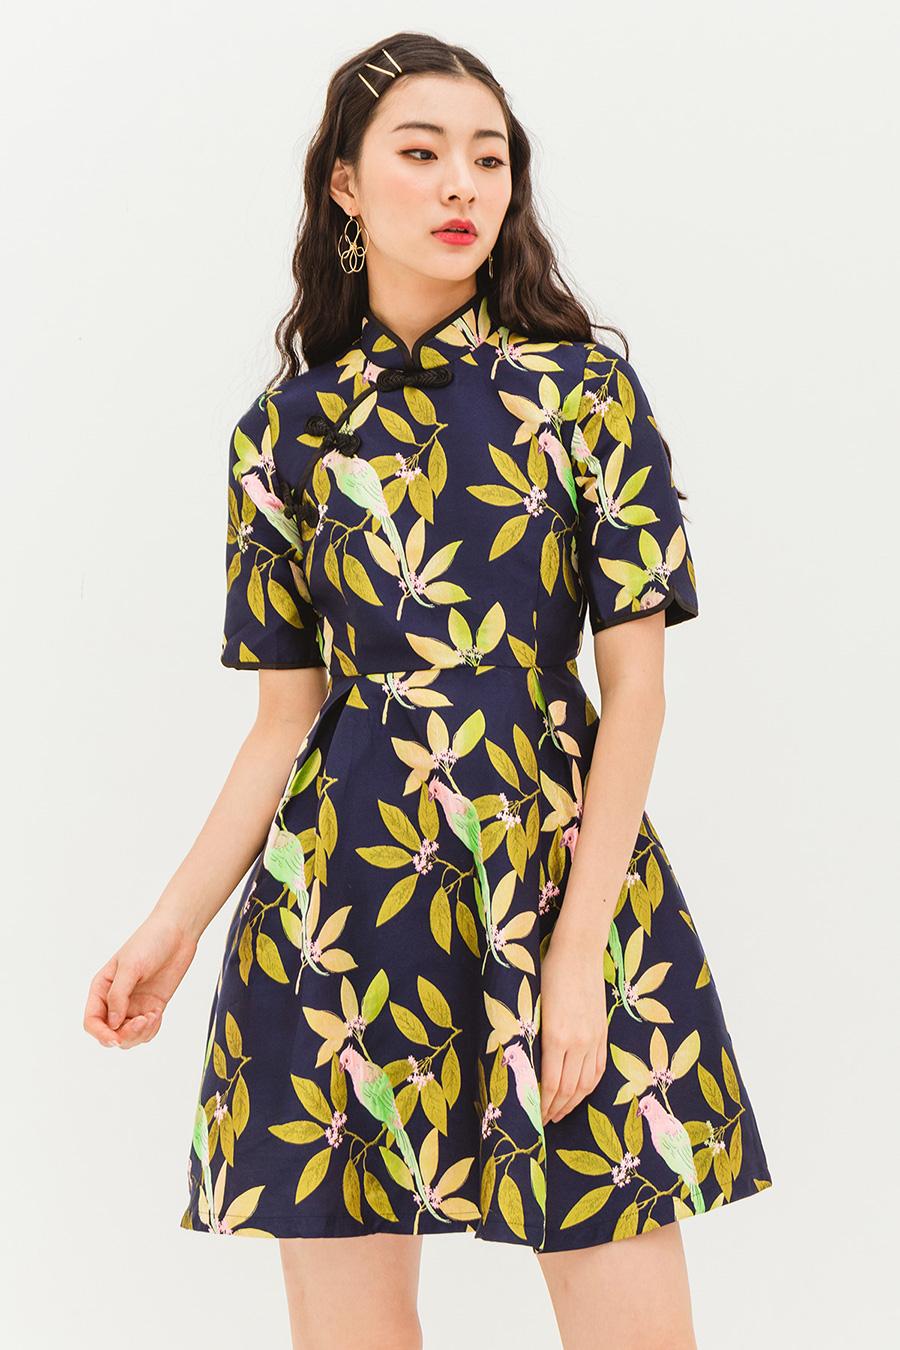 LARA DRESS - MIDNIGHT ORIENT